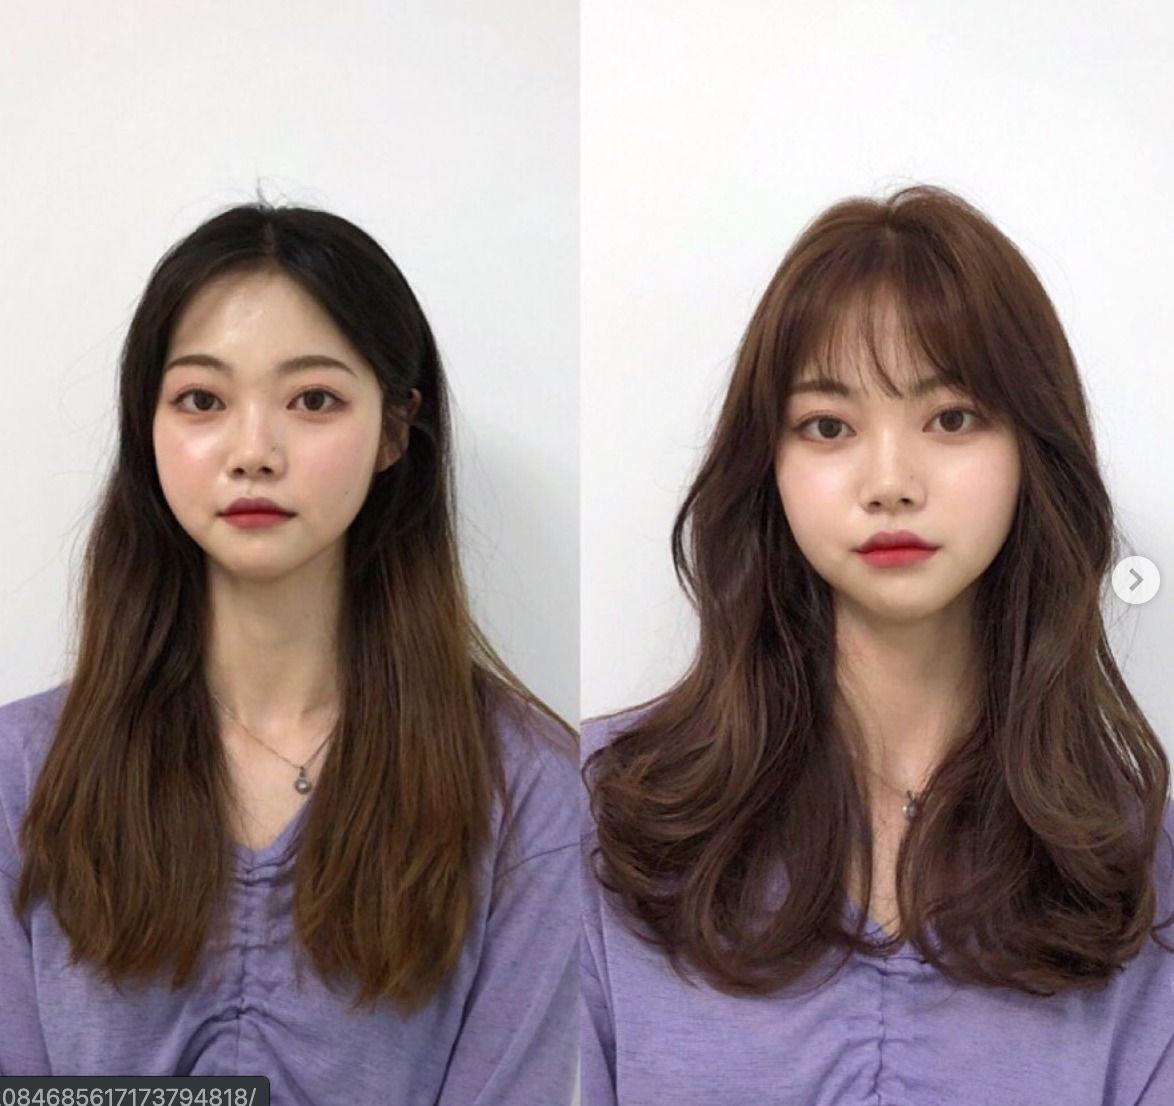 These Are The Hottest Korean Bangs In 2019 Top Beauty Lifestyles Korean Long Hair Korean Short Hair Long Hair Styles